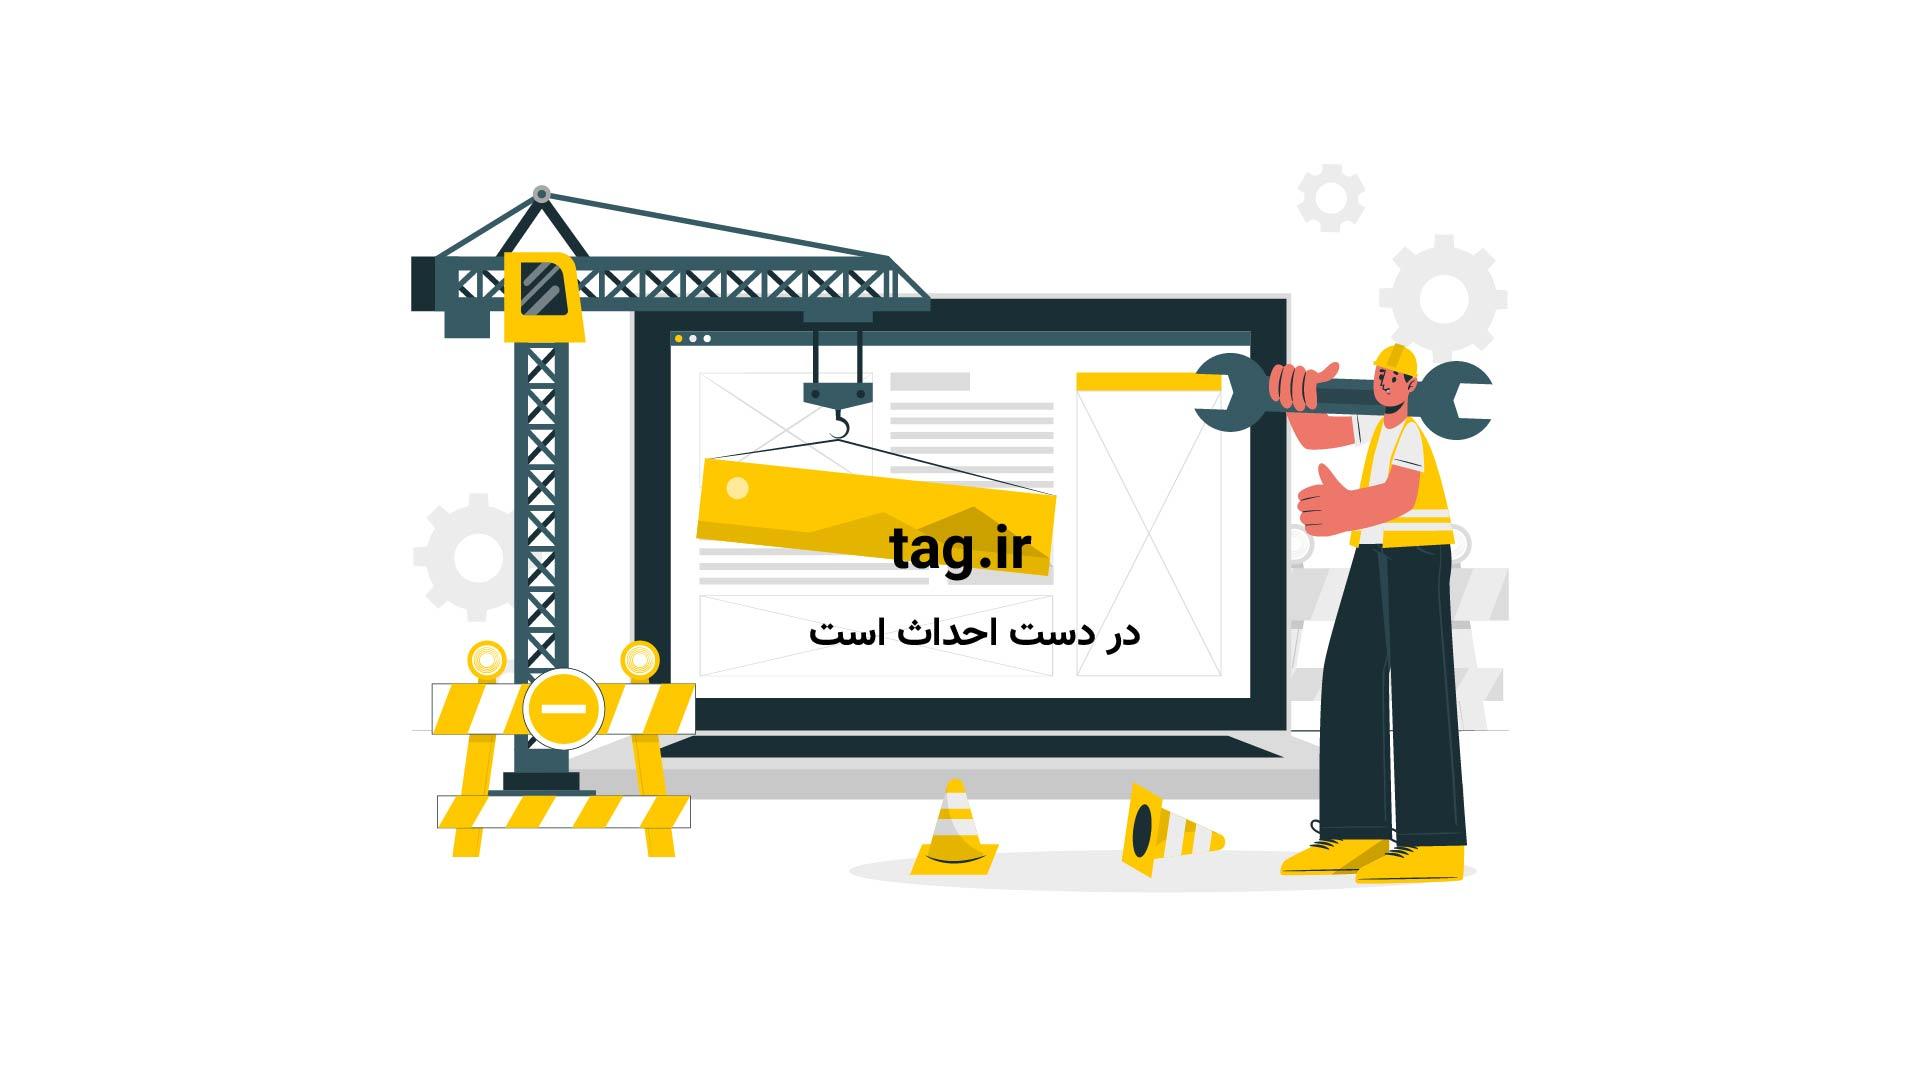 انفجار انتحاری عربستان | تگ